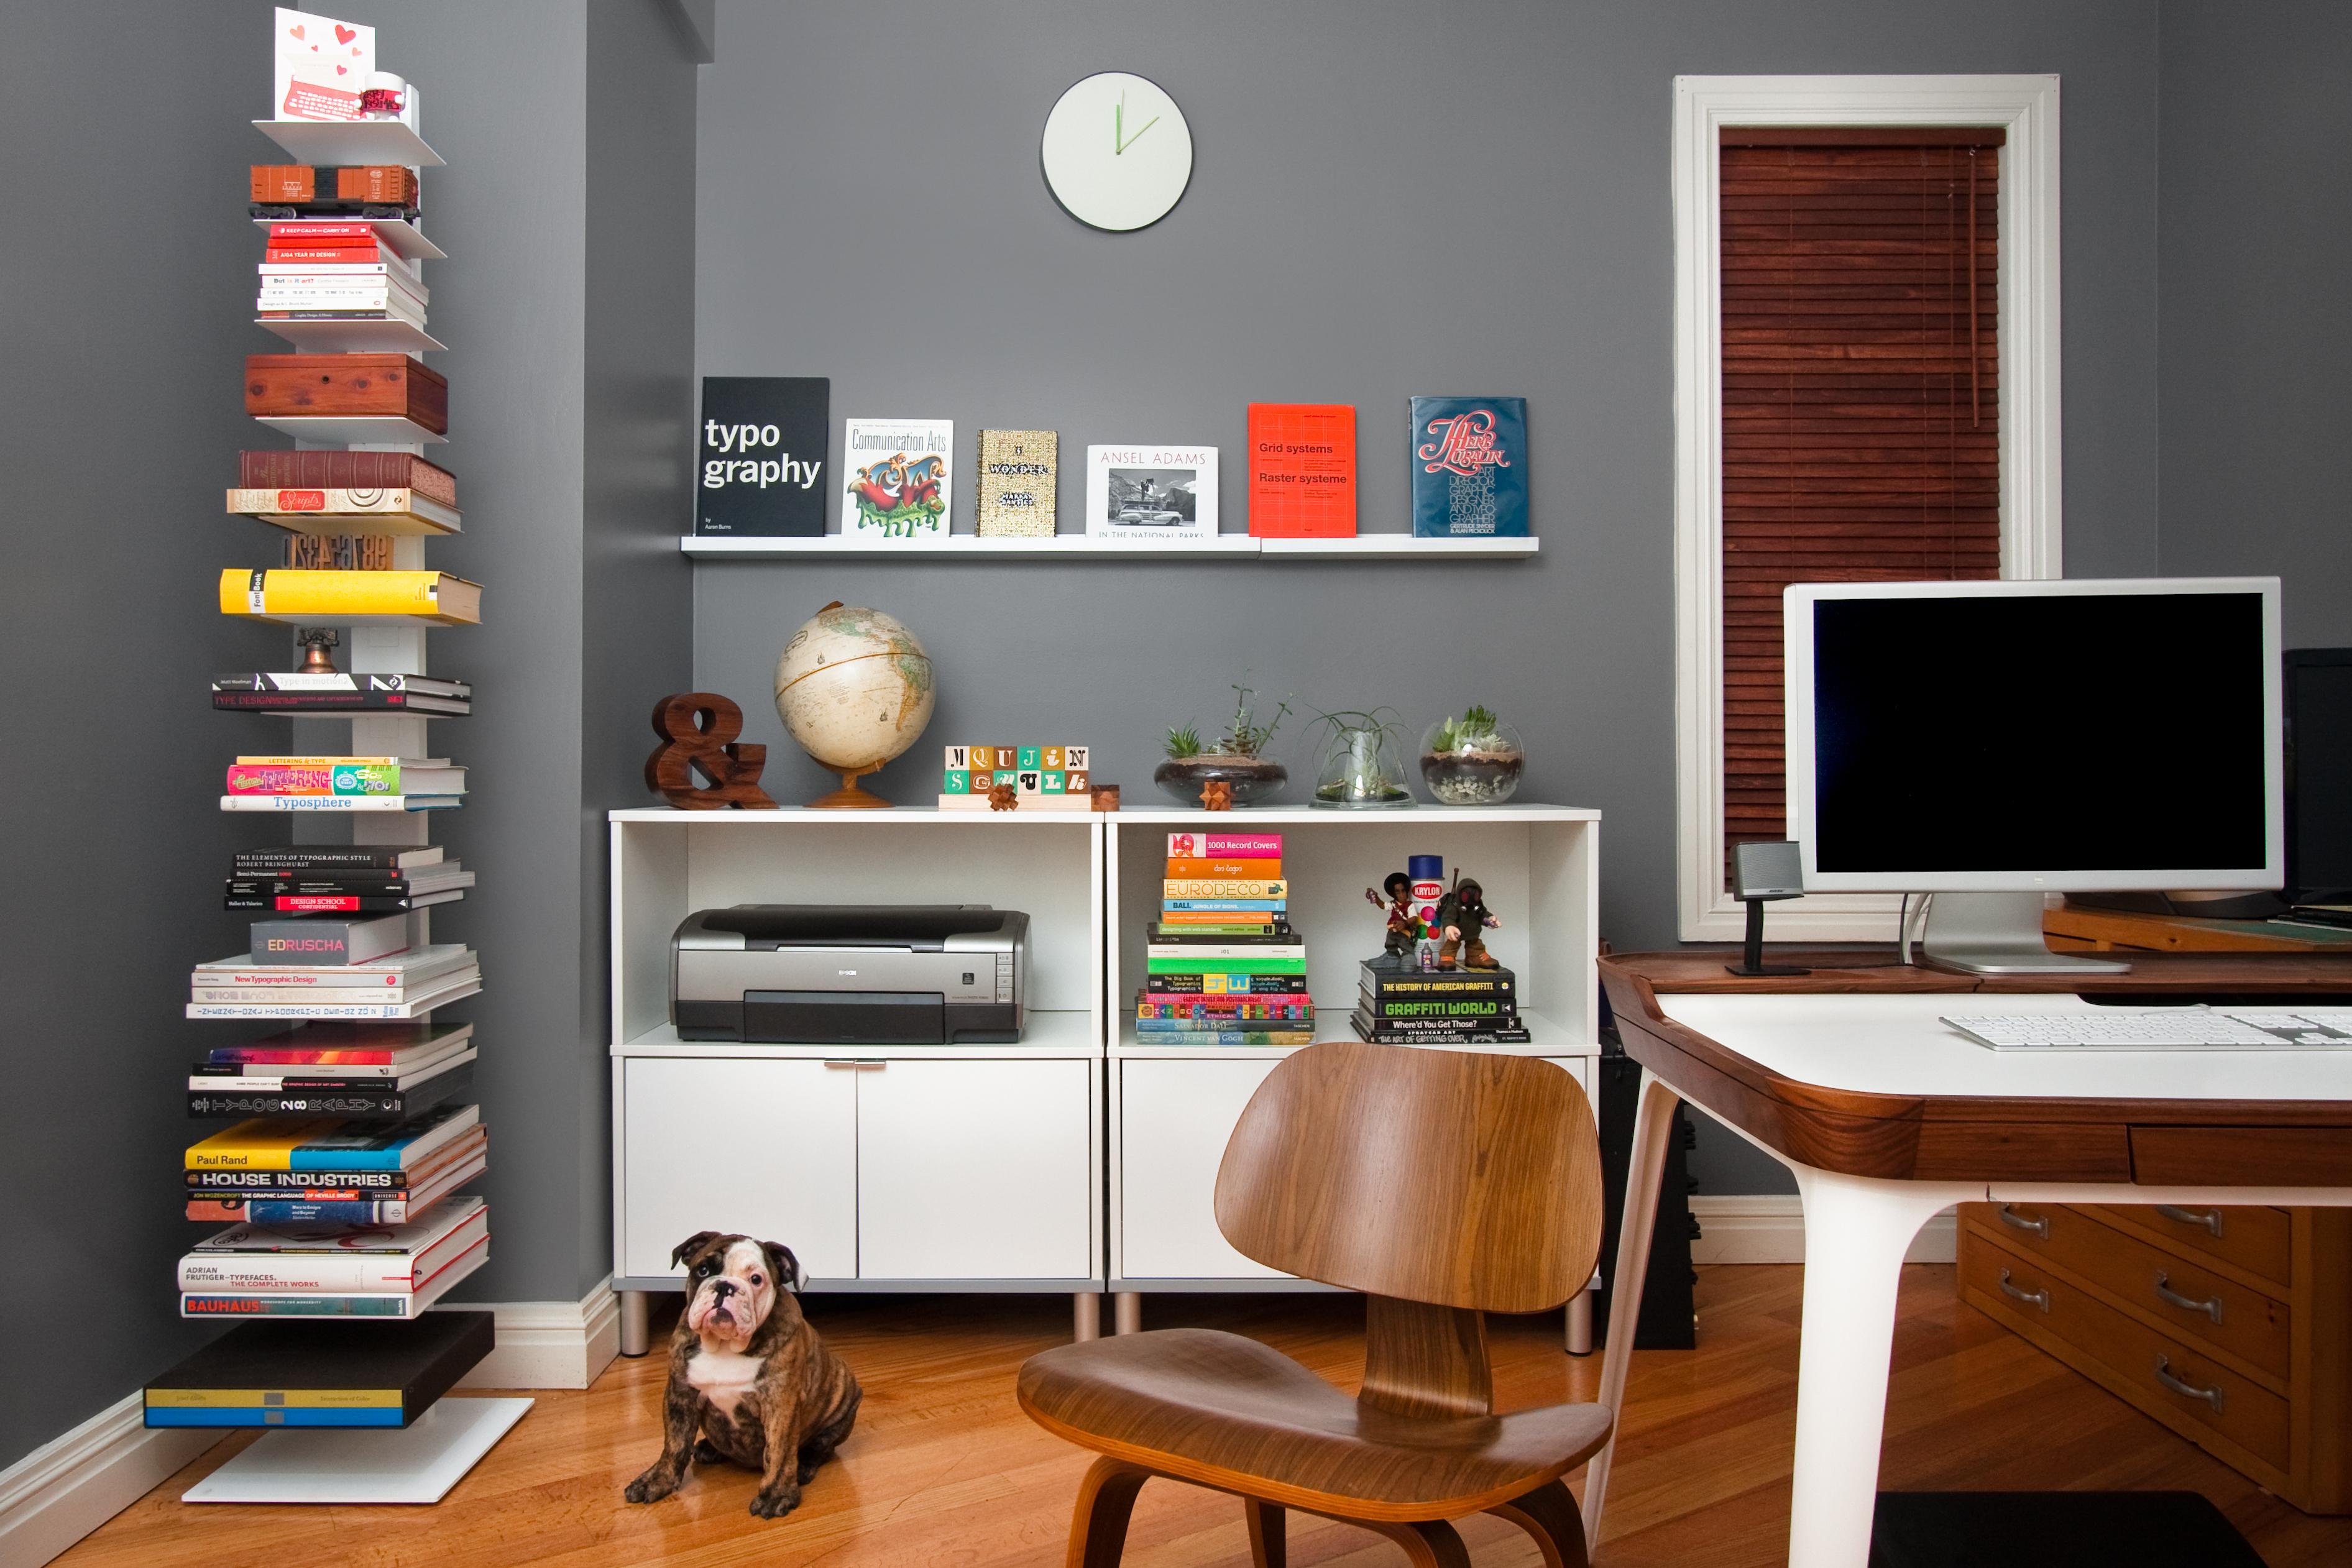 Stili darredamento e design moderni: diventare arredatore dinterni